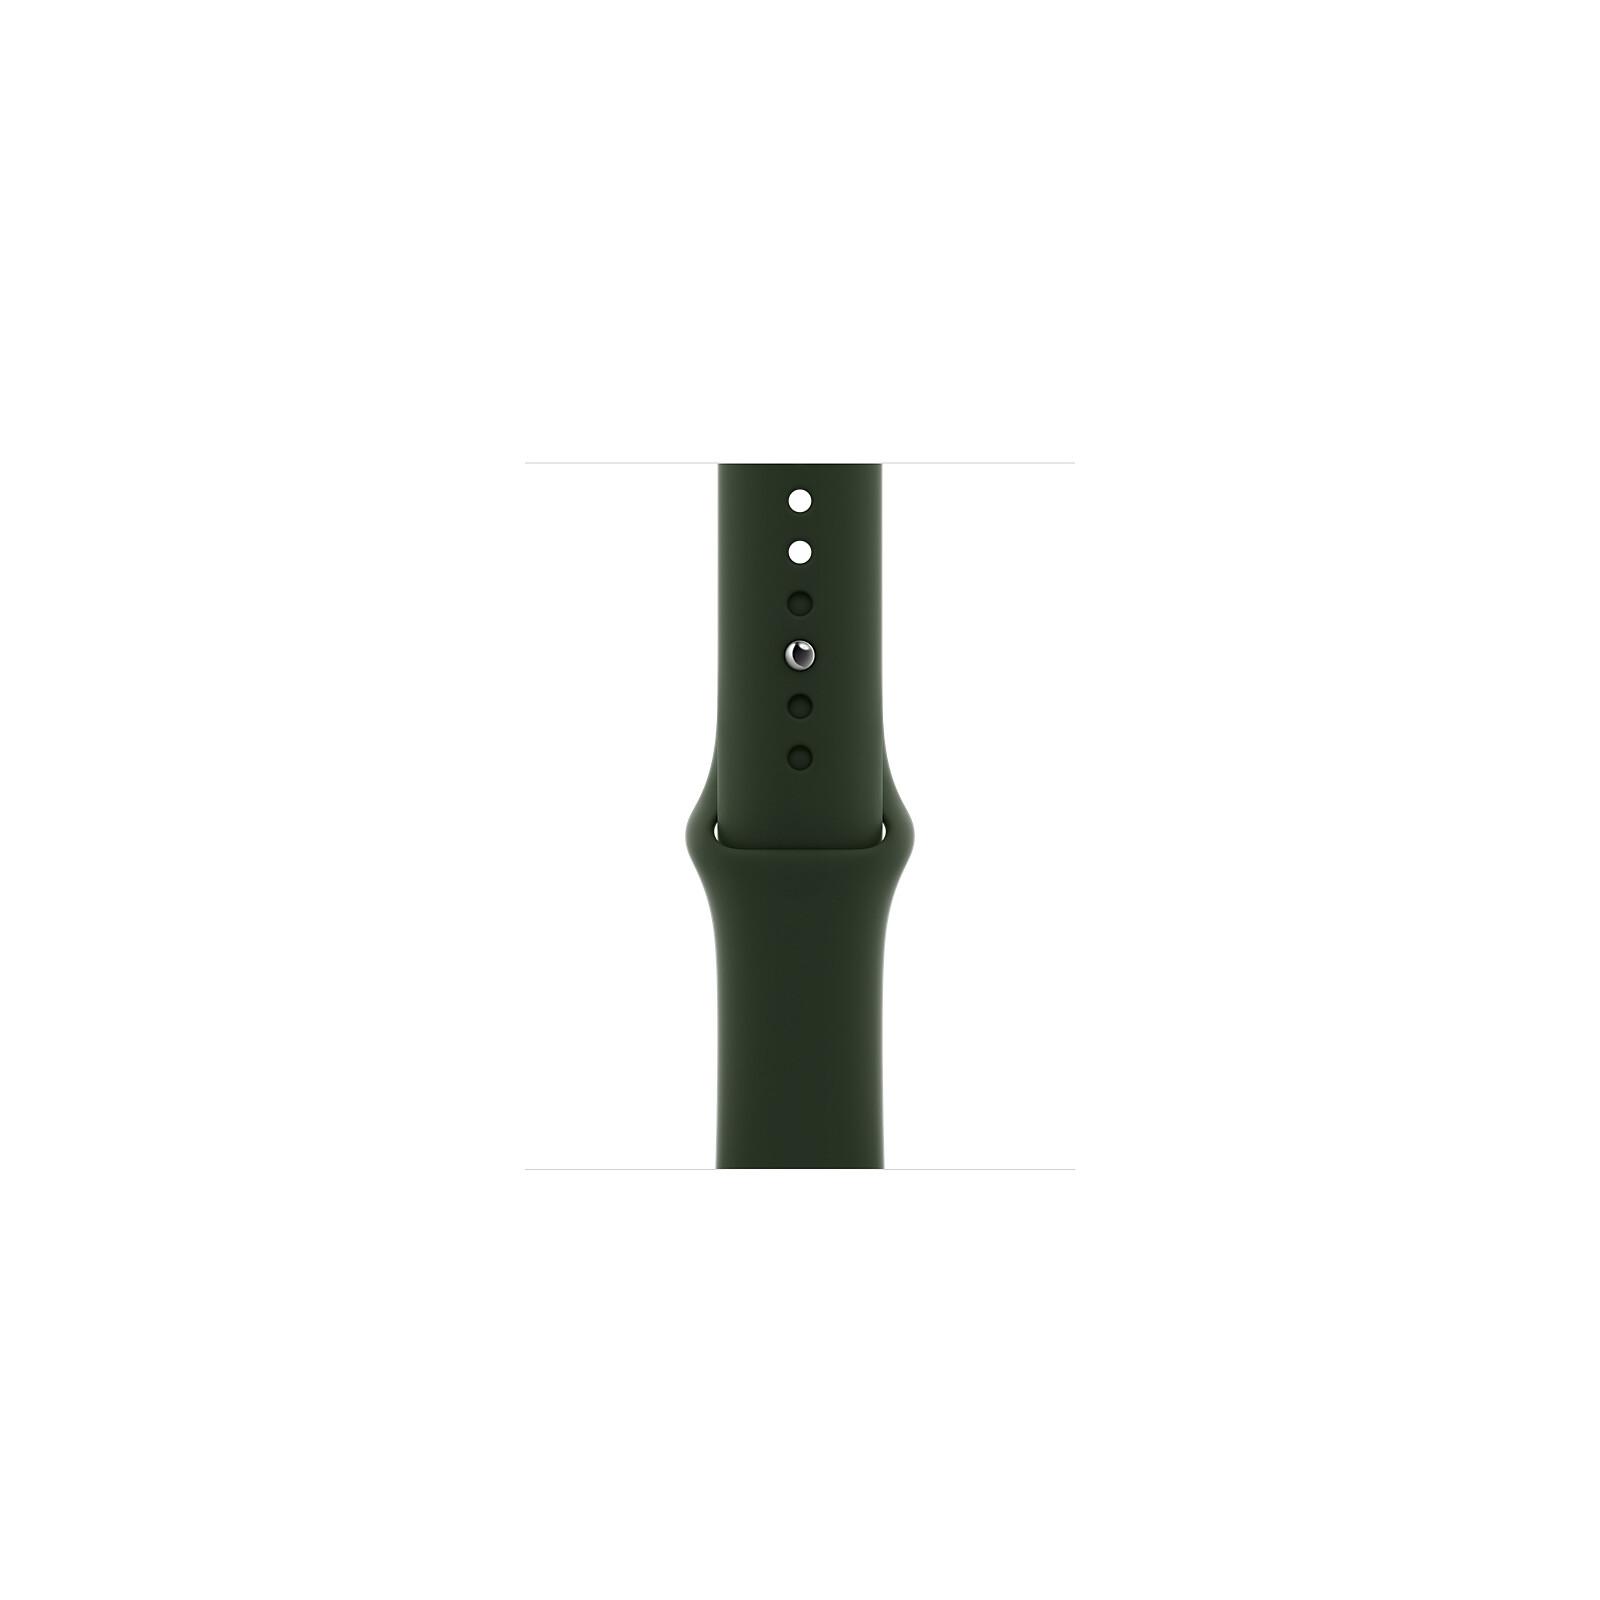 Apple Watch 40mm Sportarmband zyperngrün S/M M/L